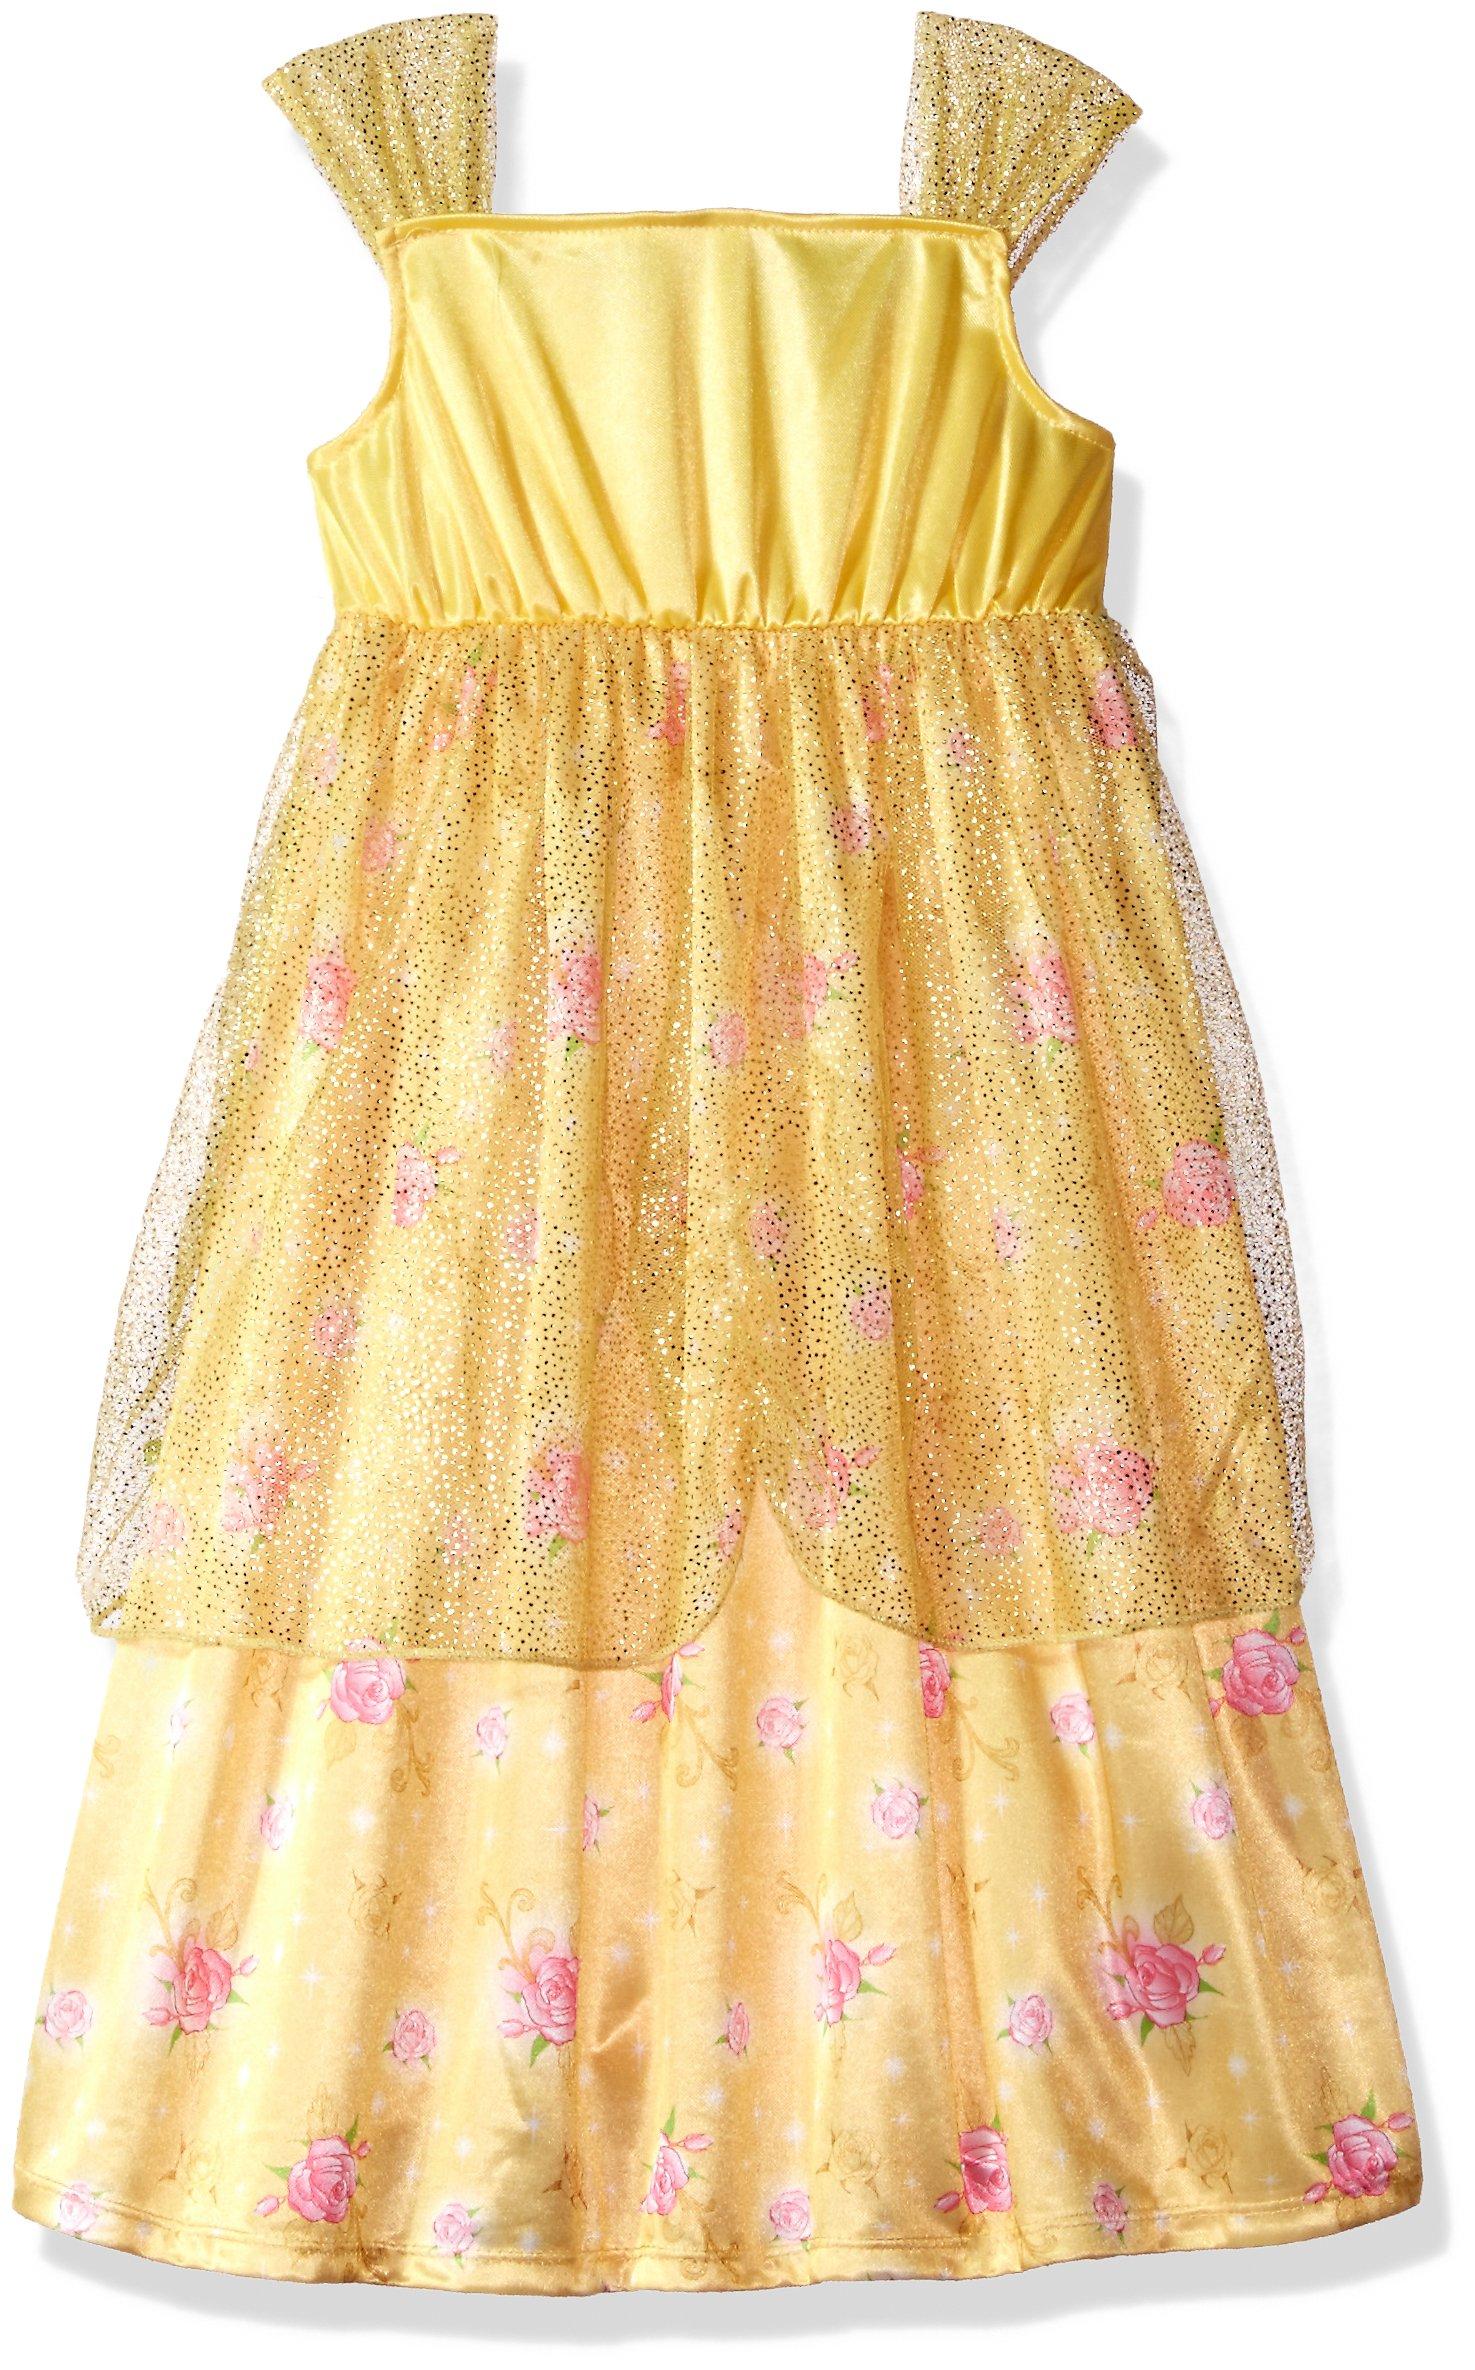 Disney Big Girls\' Fantasy Nightgowns, Belle Gold, 8 - 21DP243GGTAZ ...